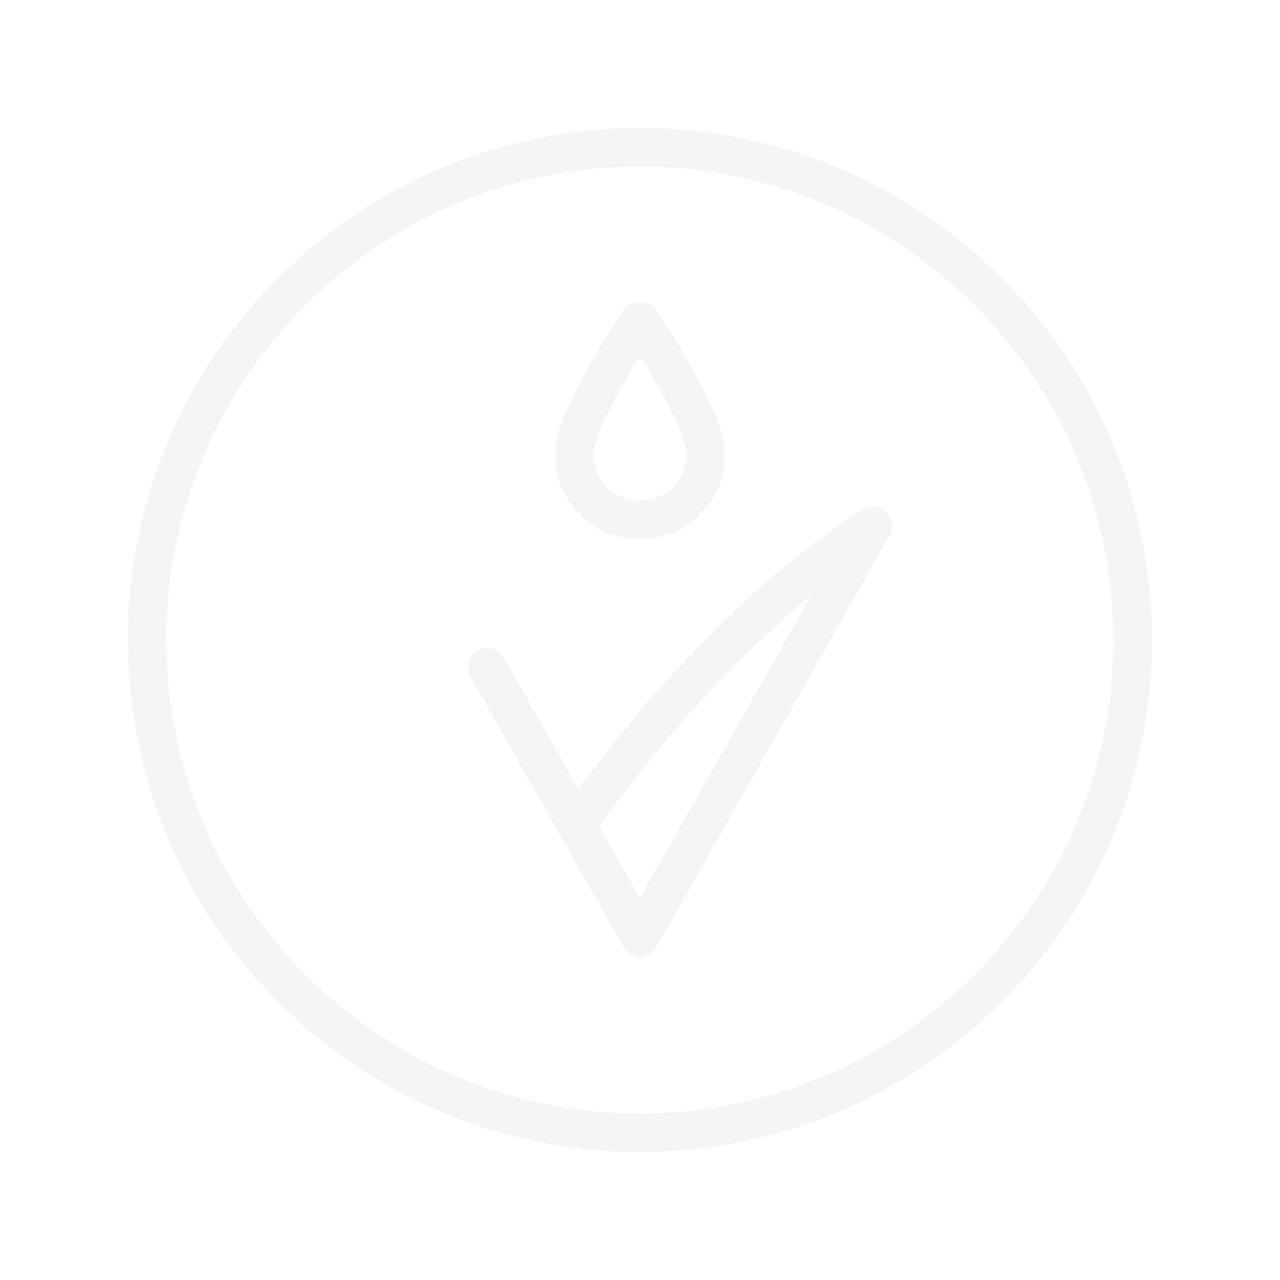 MADARA Soothing Roll-On Deodorant 50ml